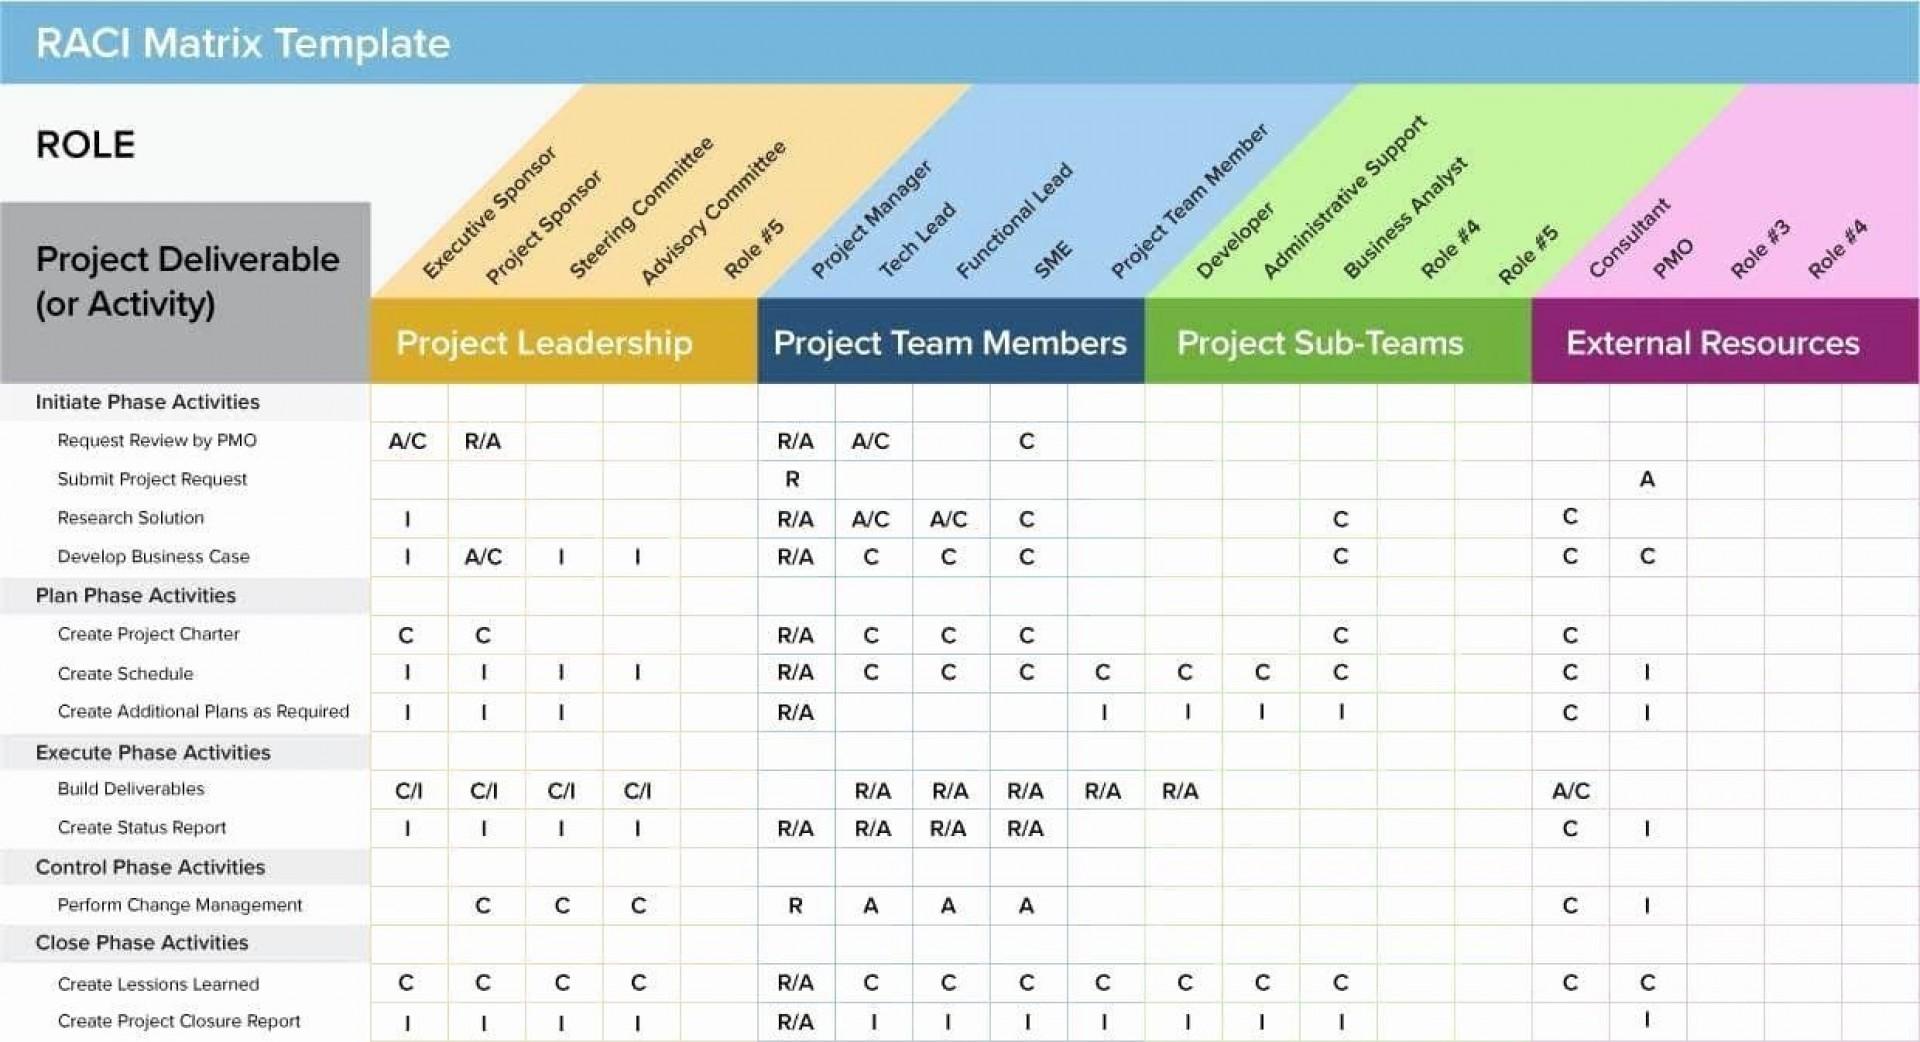 003 Magnificent Project Management Progres Report Template Excel High Def  Statu1920